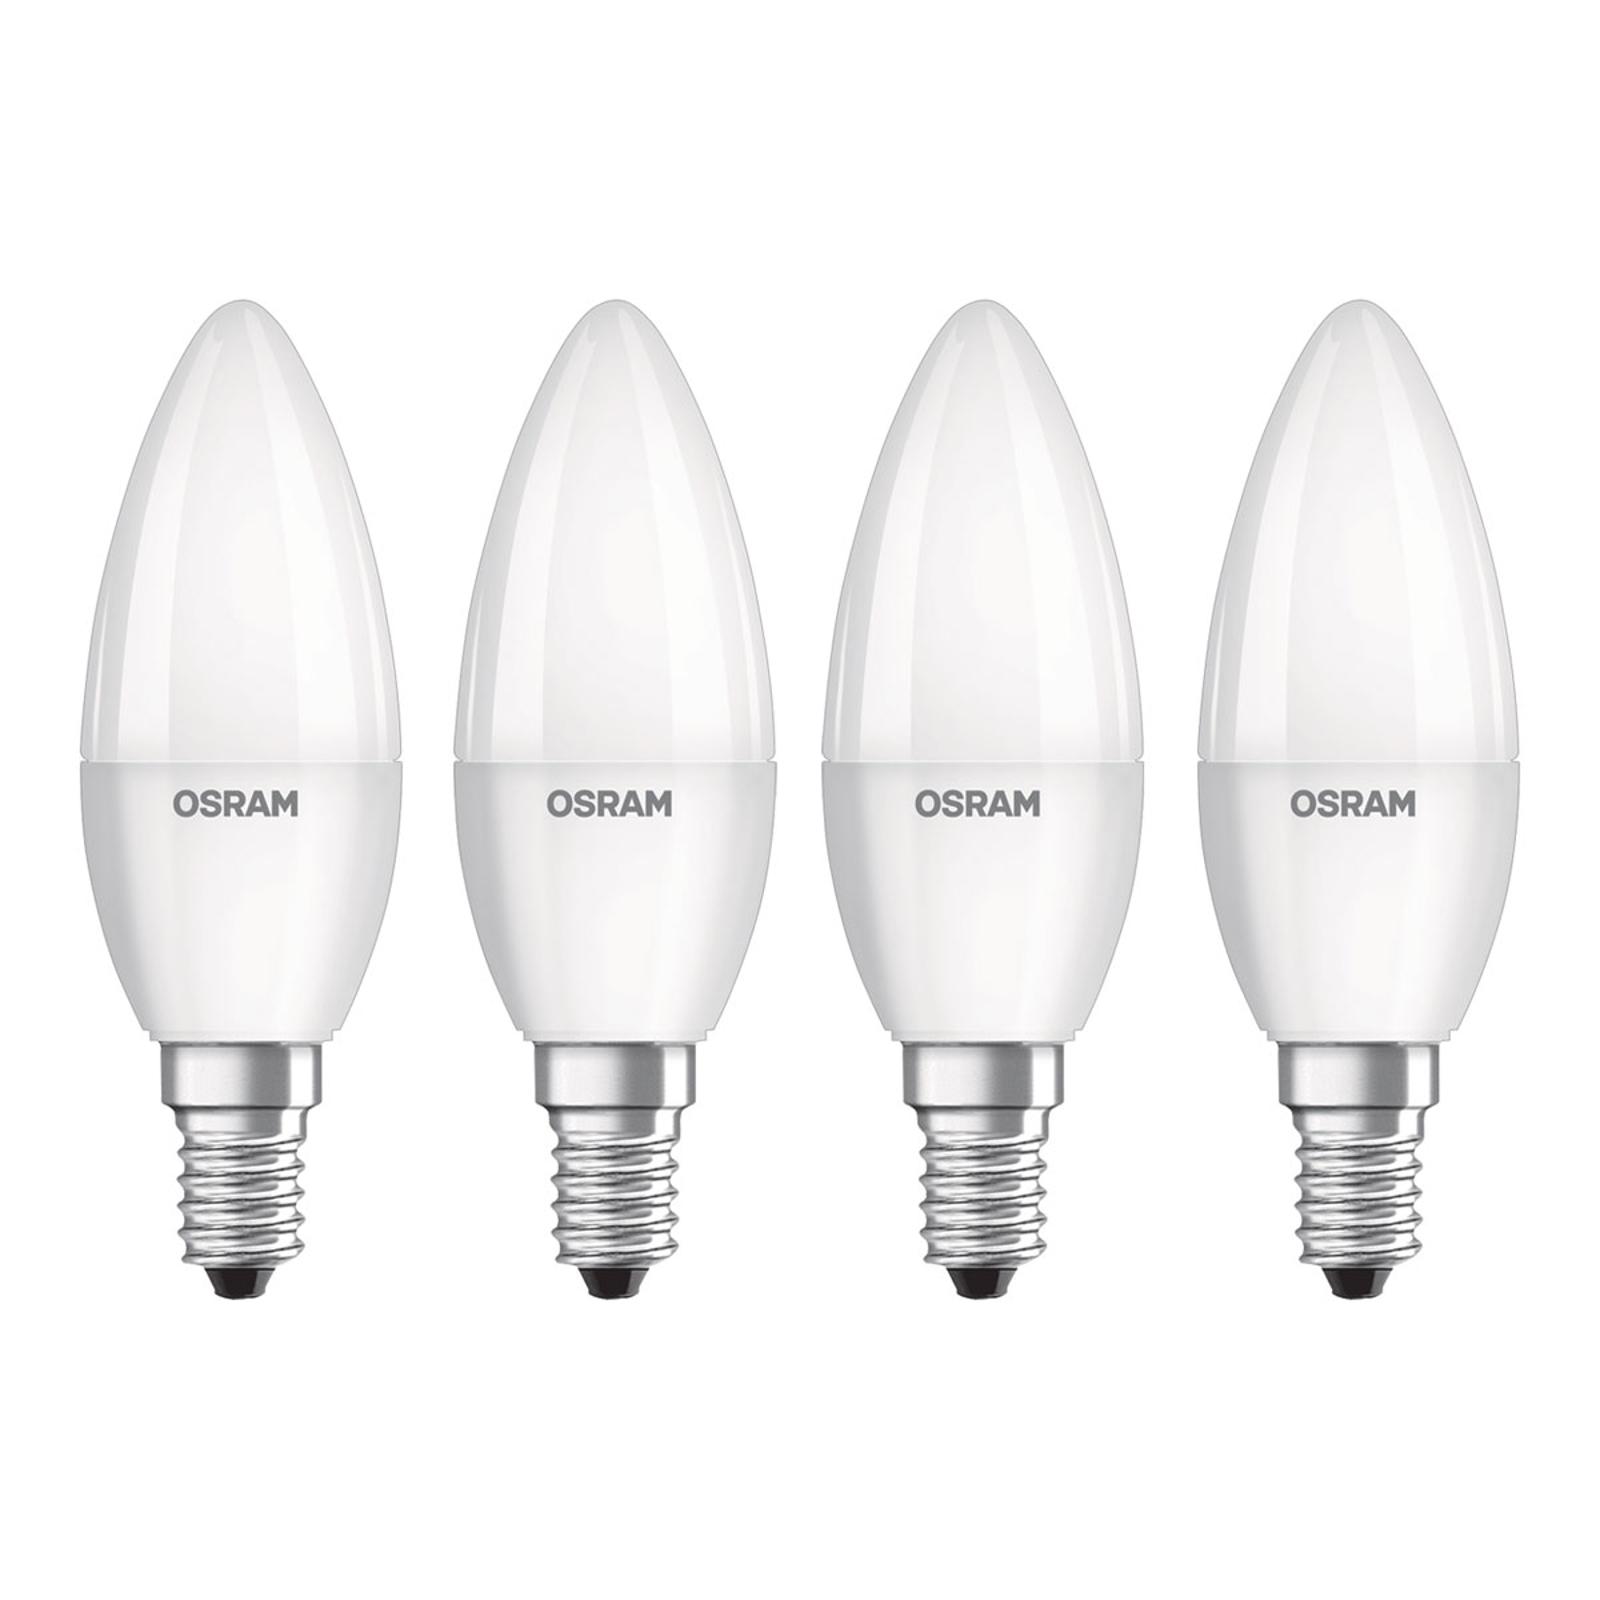 OSRAM LED-mignon E14 Base Retro 5,7W 4-pk, 4000K